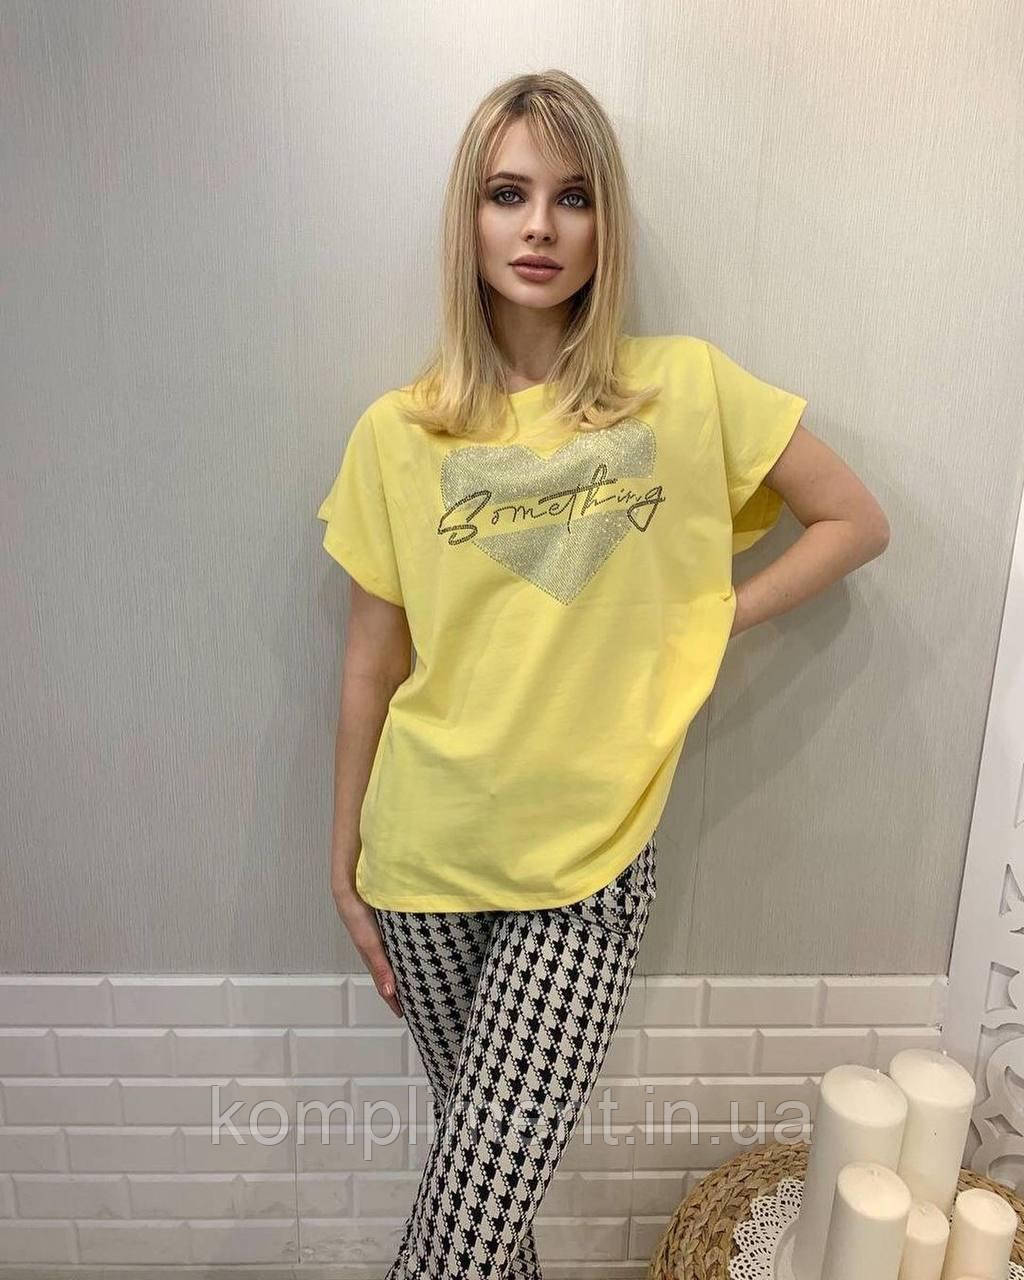 Женская турецкая трикотажная летняя футболка украшенная камнями,желтая № 7873